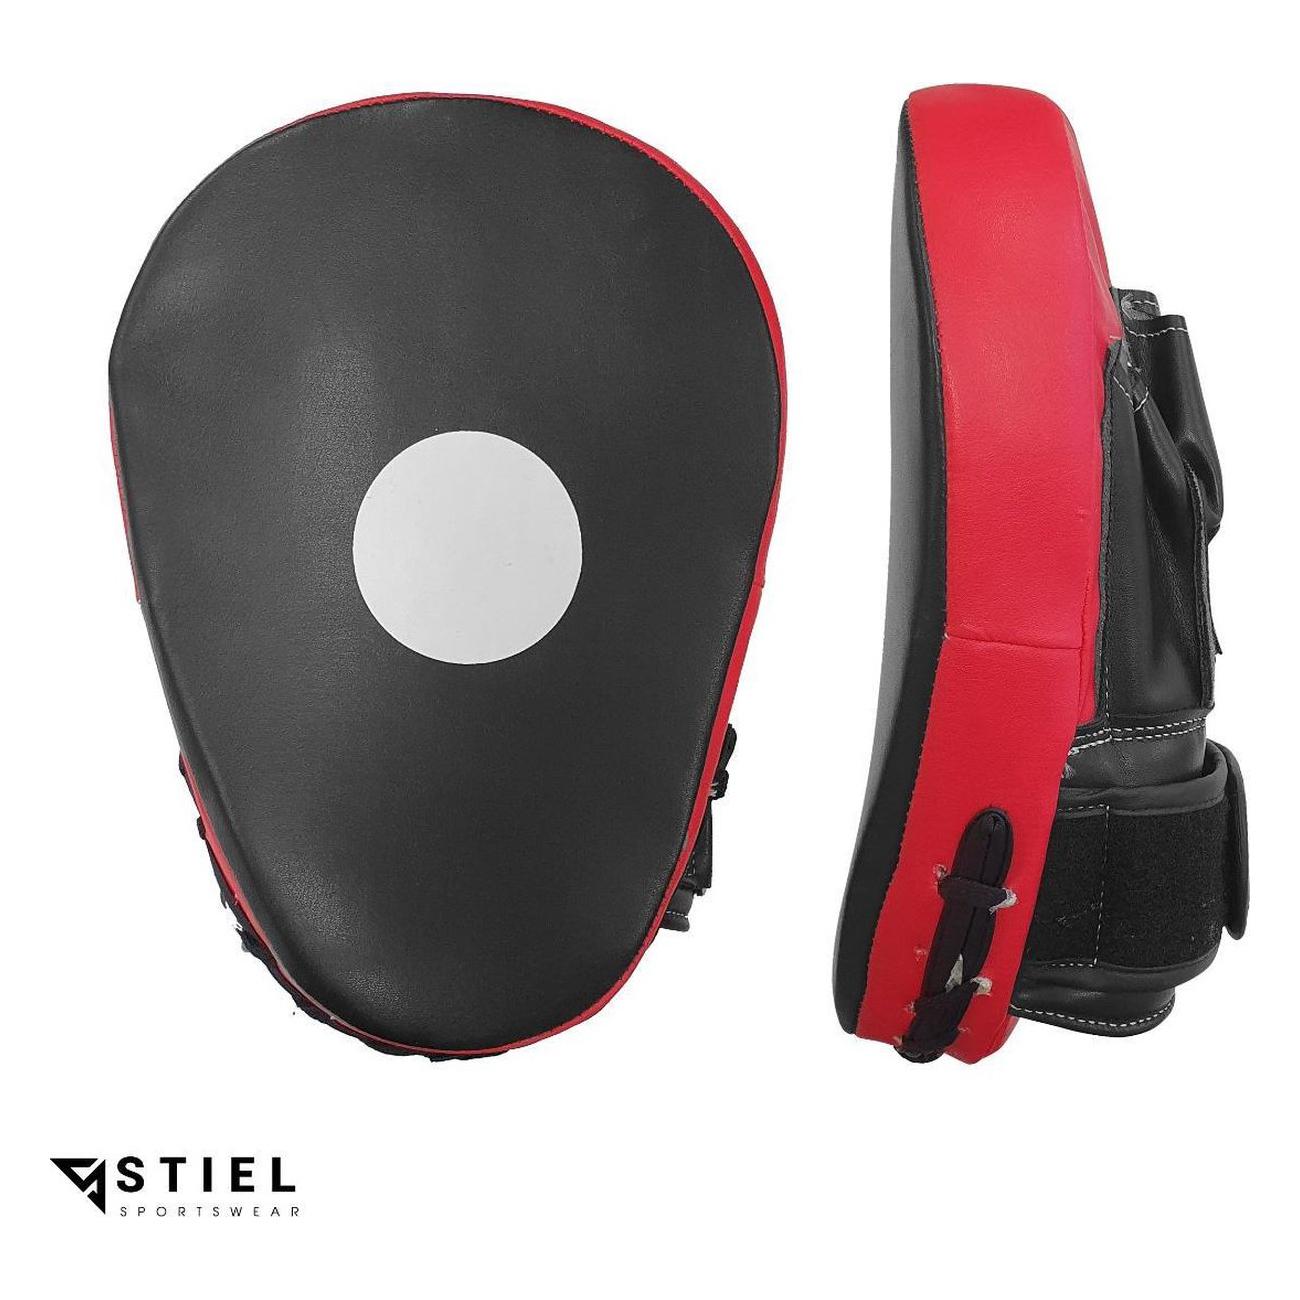 Stiel Handpad – Stootpad – PU – Zwart met rood